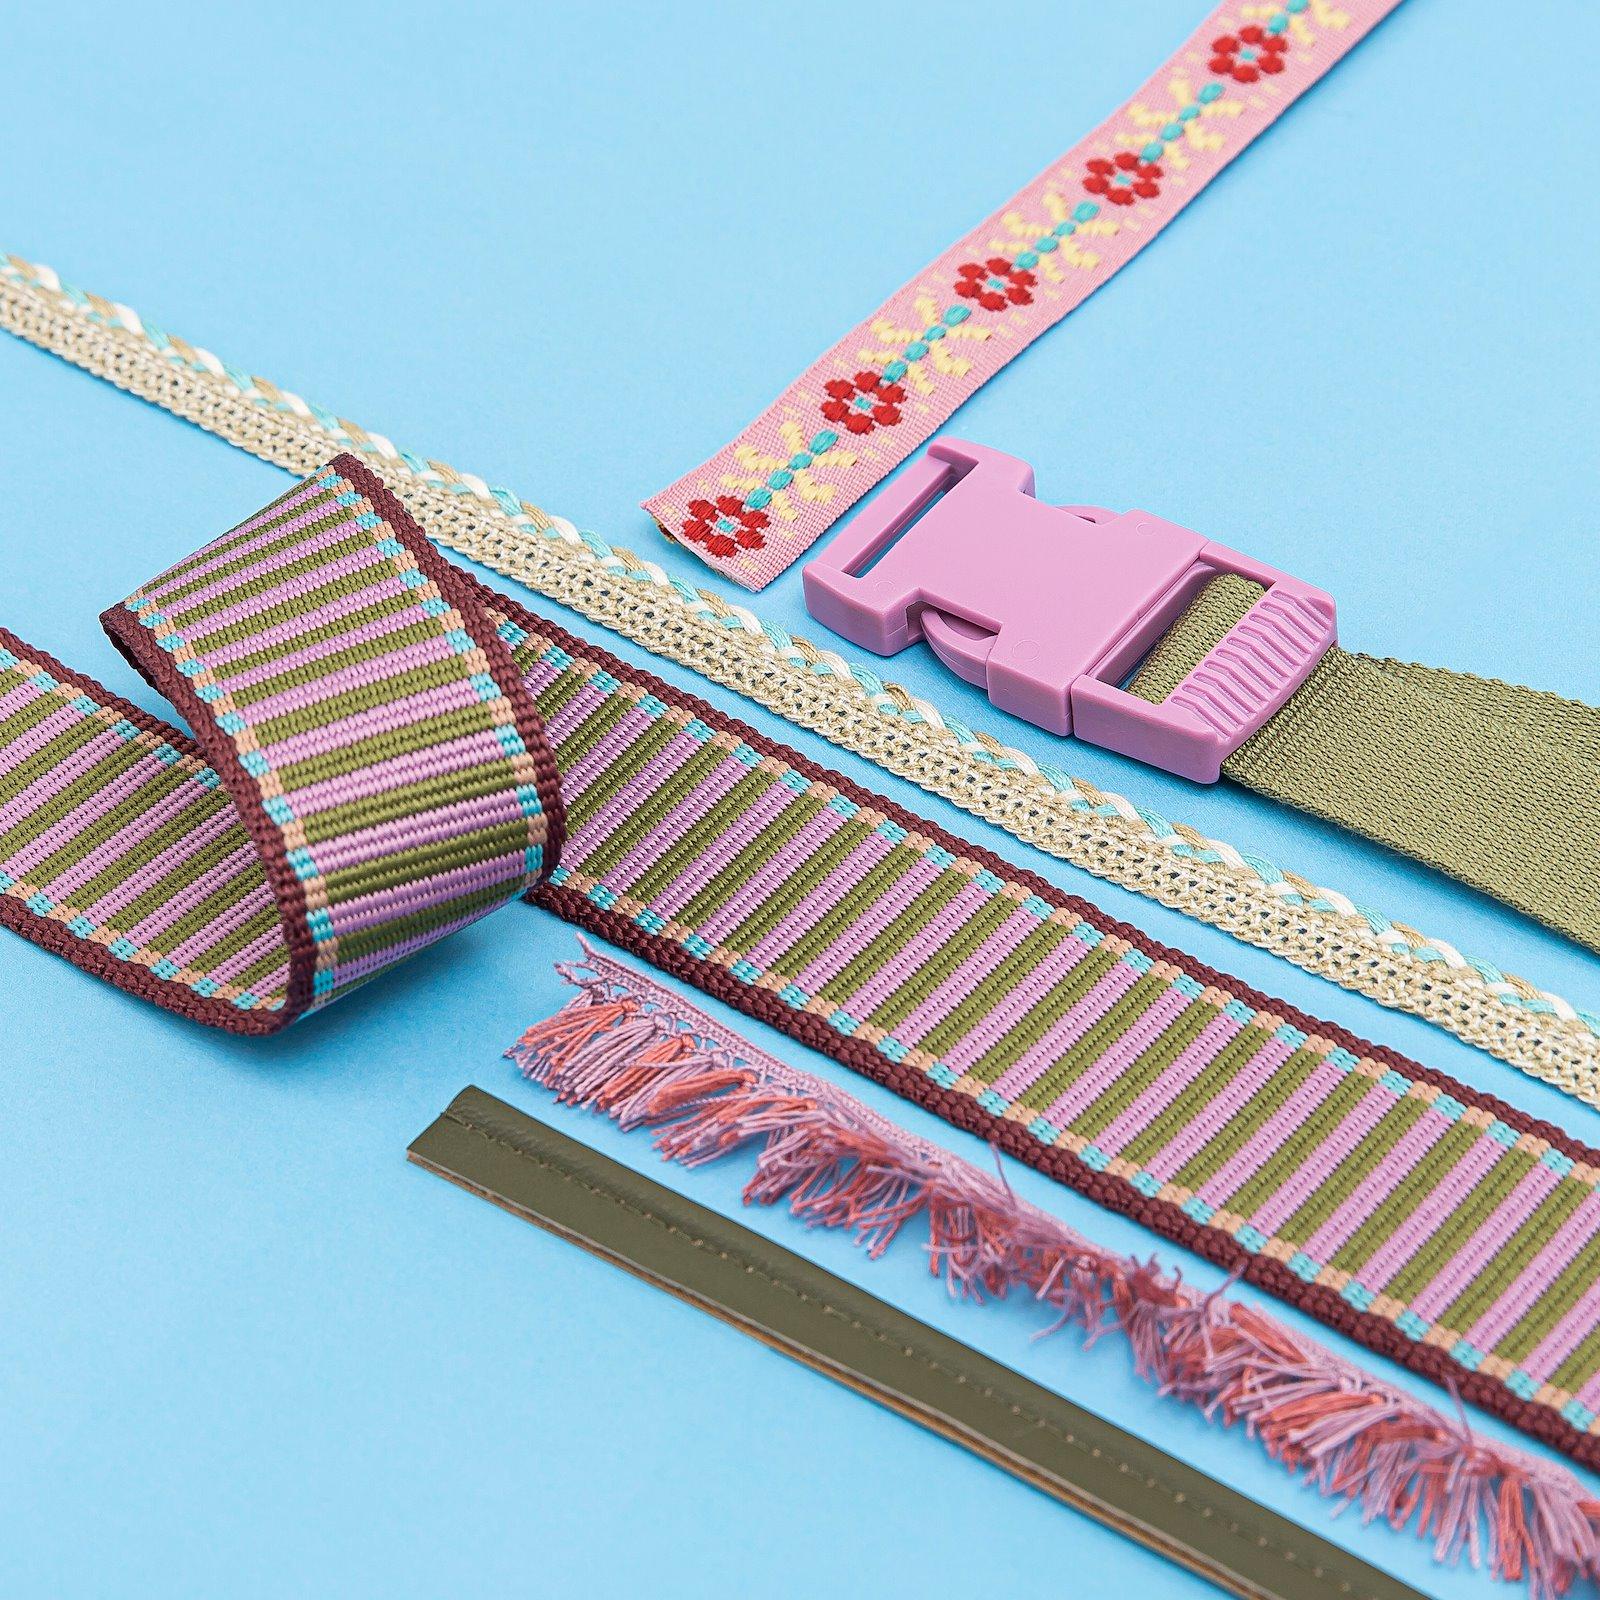 Ribbon braid 12mm beige/light petrol 2m 22226_22295_22411_45201_22299_22239_22374_bundle